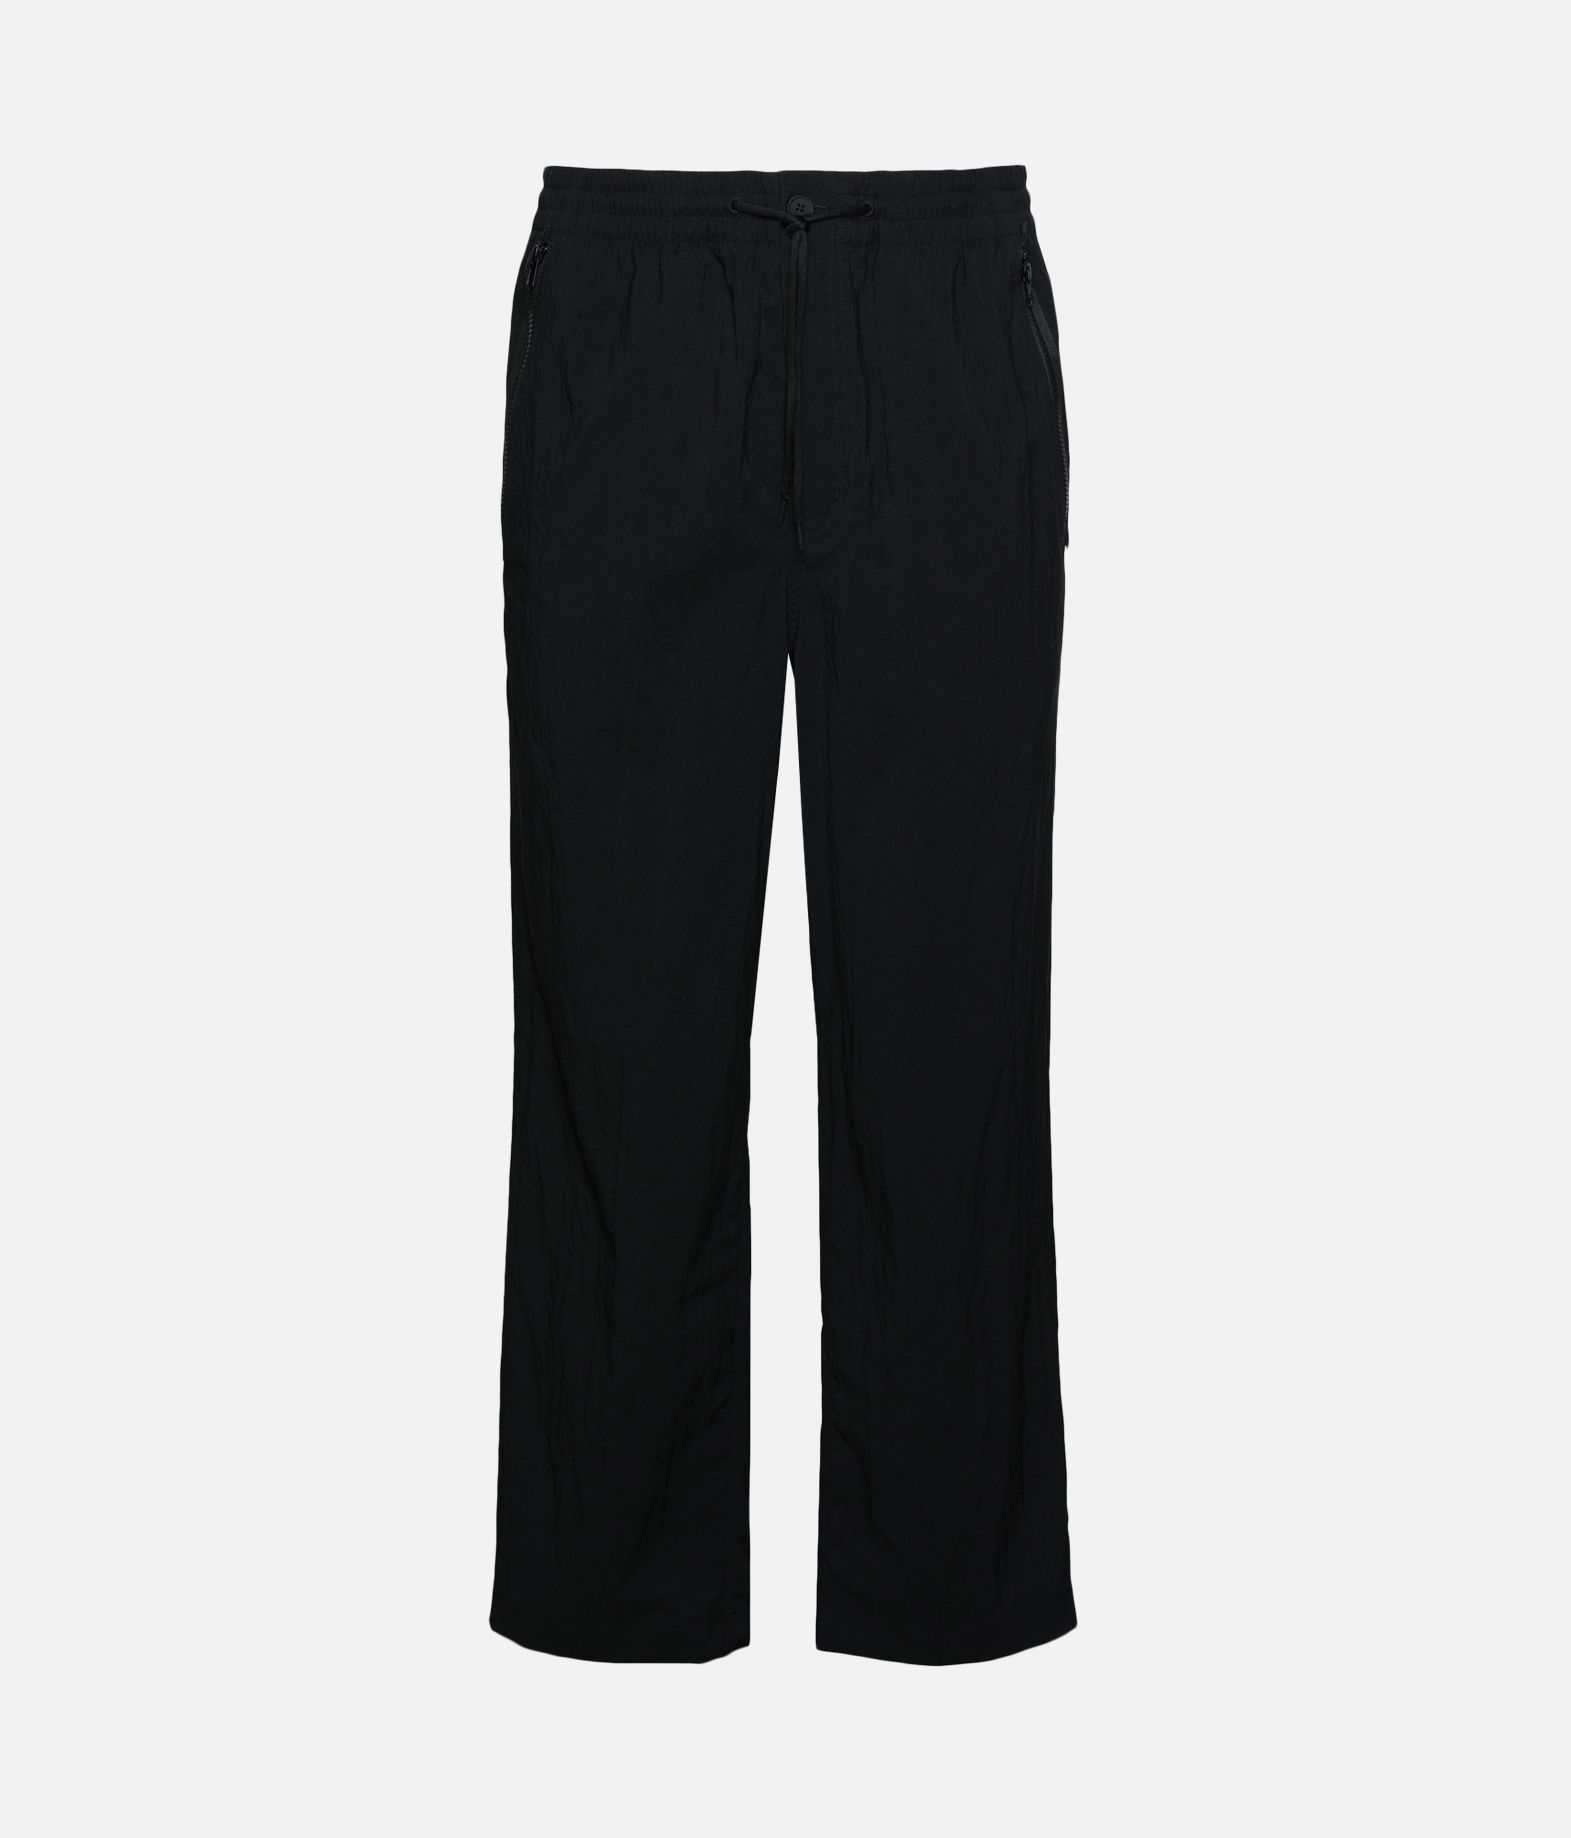 Y-3 Y-3 Slim Twill Pants Casual pants Man f